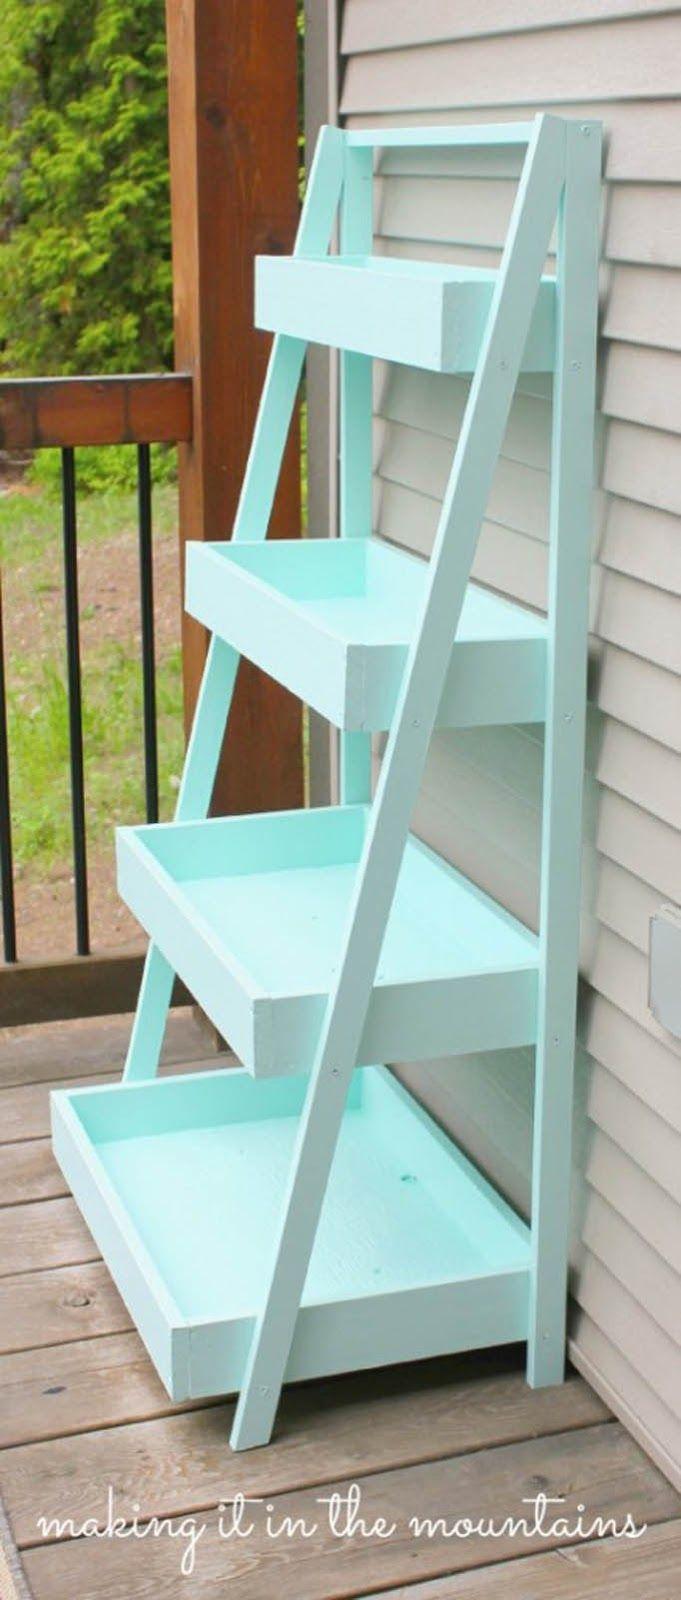 diy-estanteria-escalera-mint-decoracion-terraza